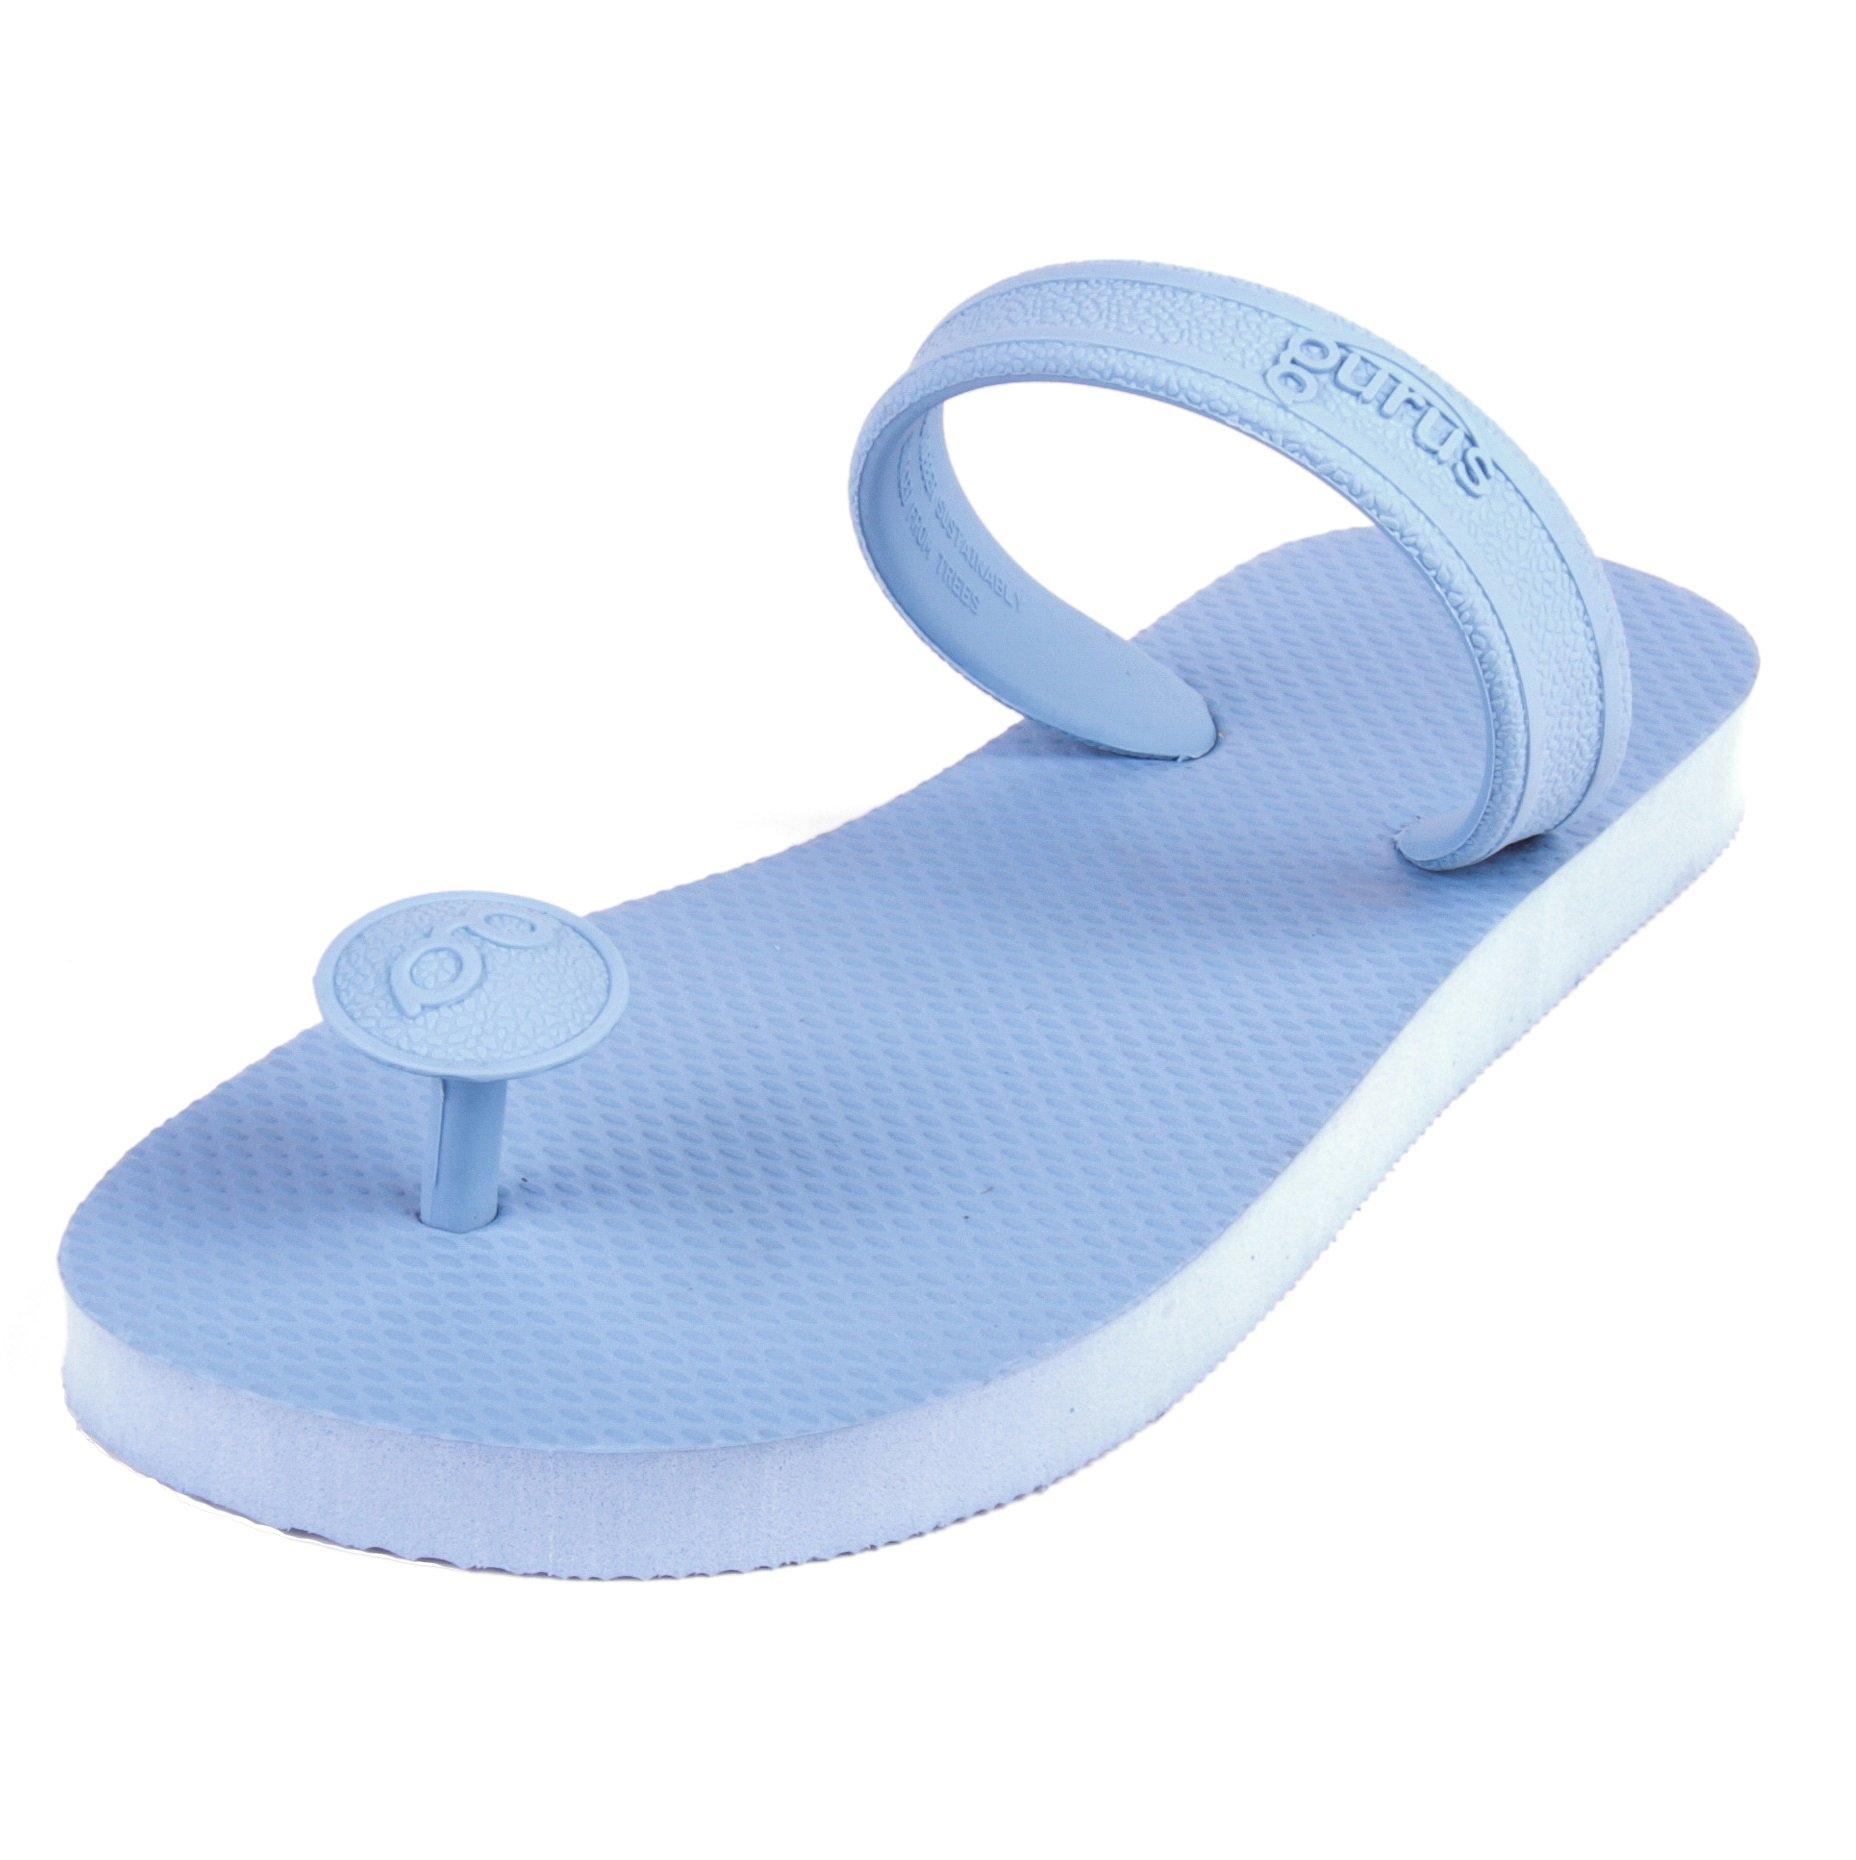 Gurus Men's Sustainable Sandals, Monsoon Natural Rubber Flip Flops, Size 12/13 US by Gurus (Image #1)